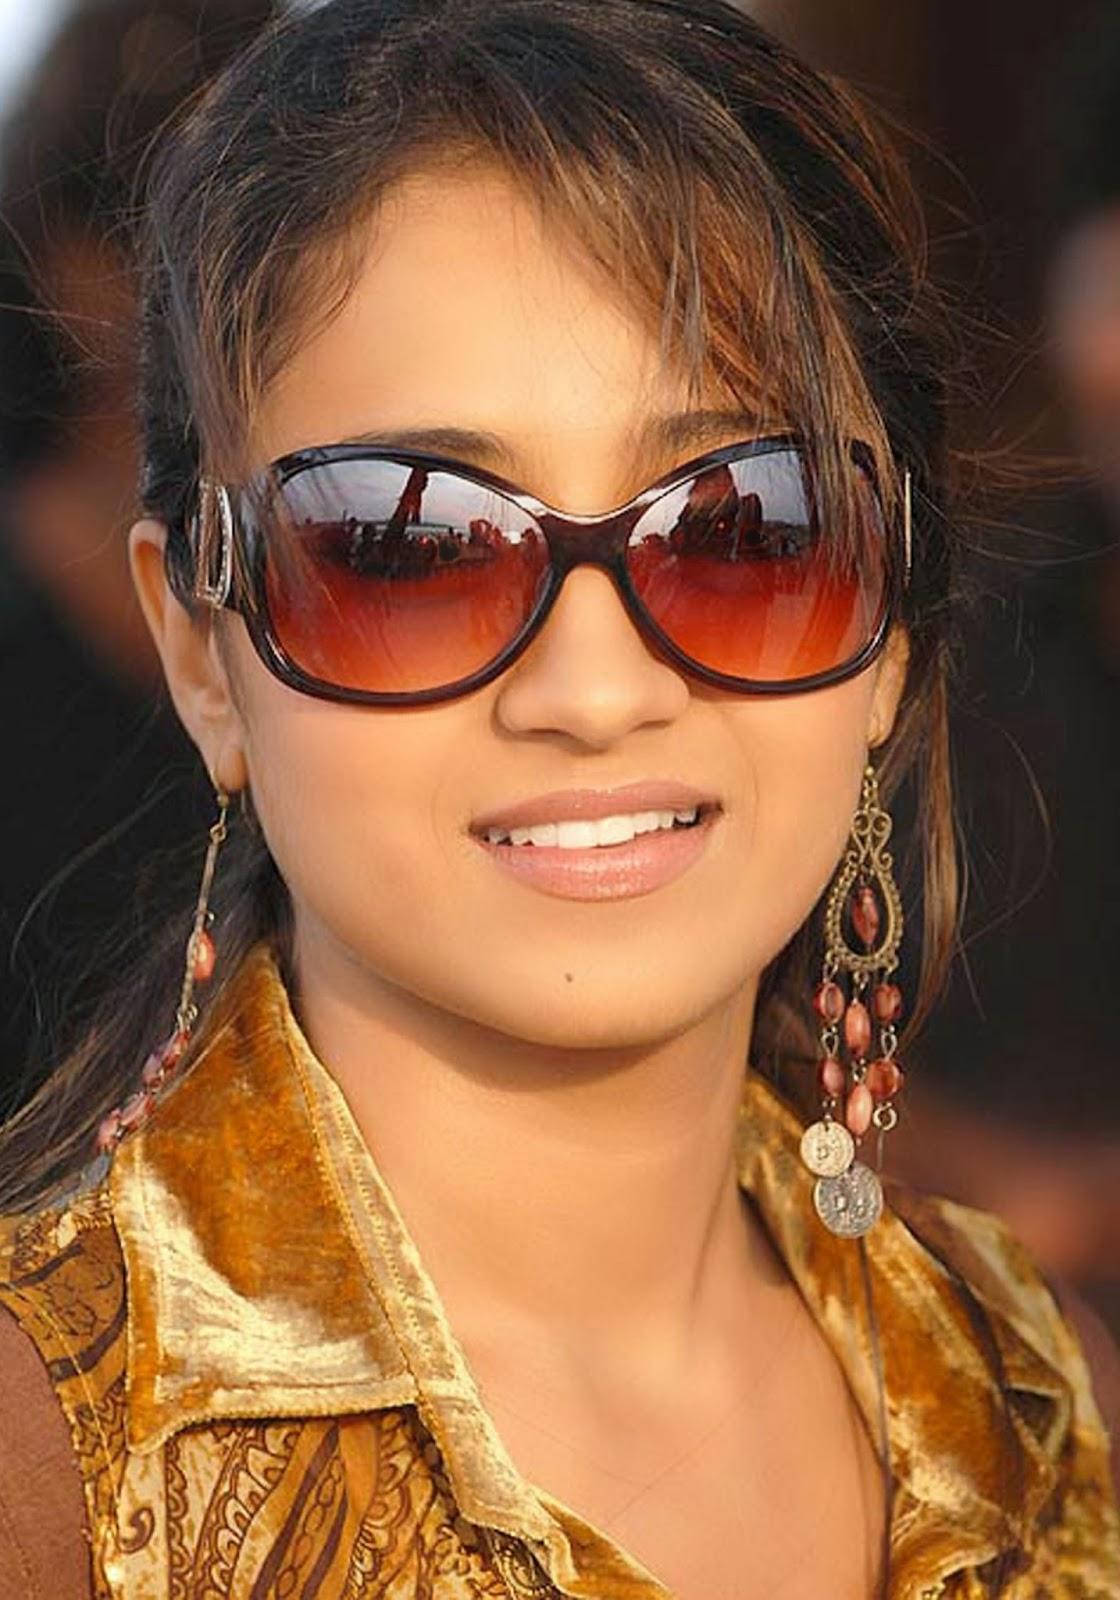 Unseen Girl Wallpaper Star Hd Photos Indian Talent Amp Crazy Trisha Krishnan